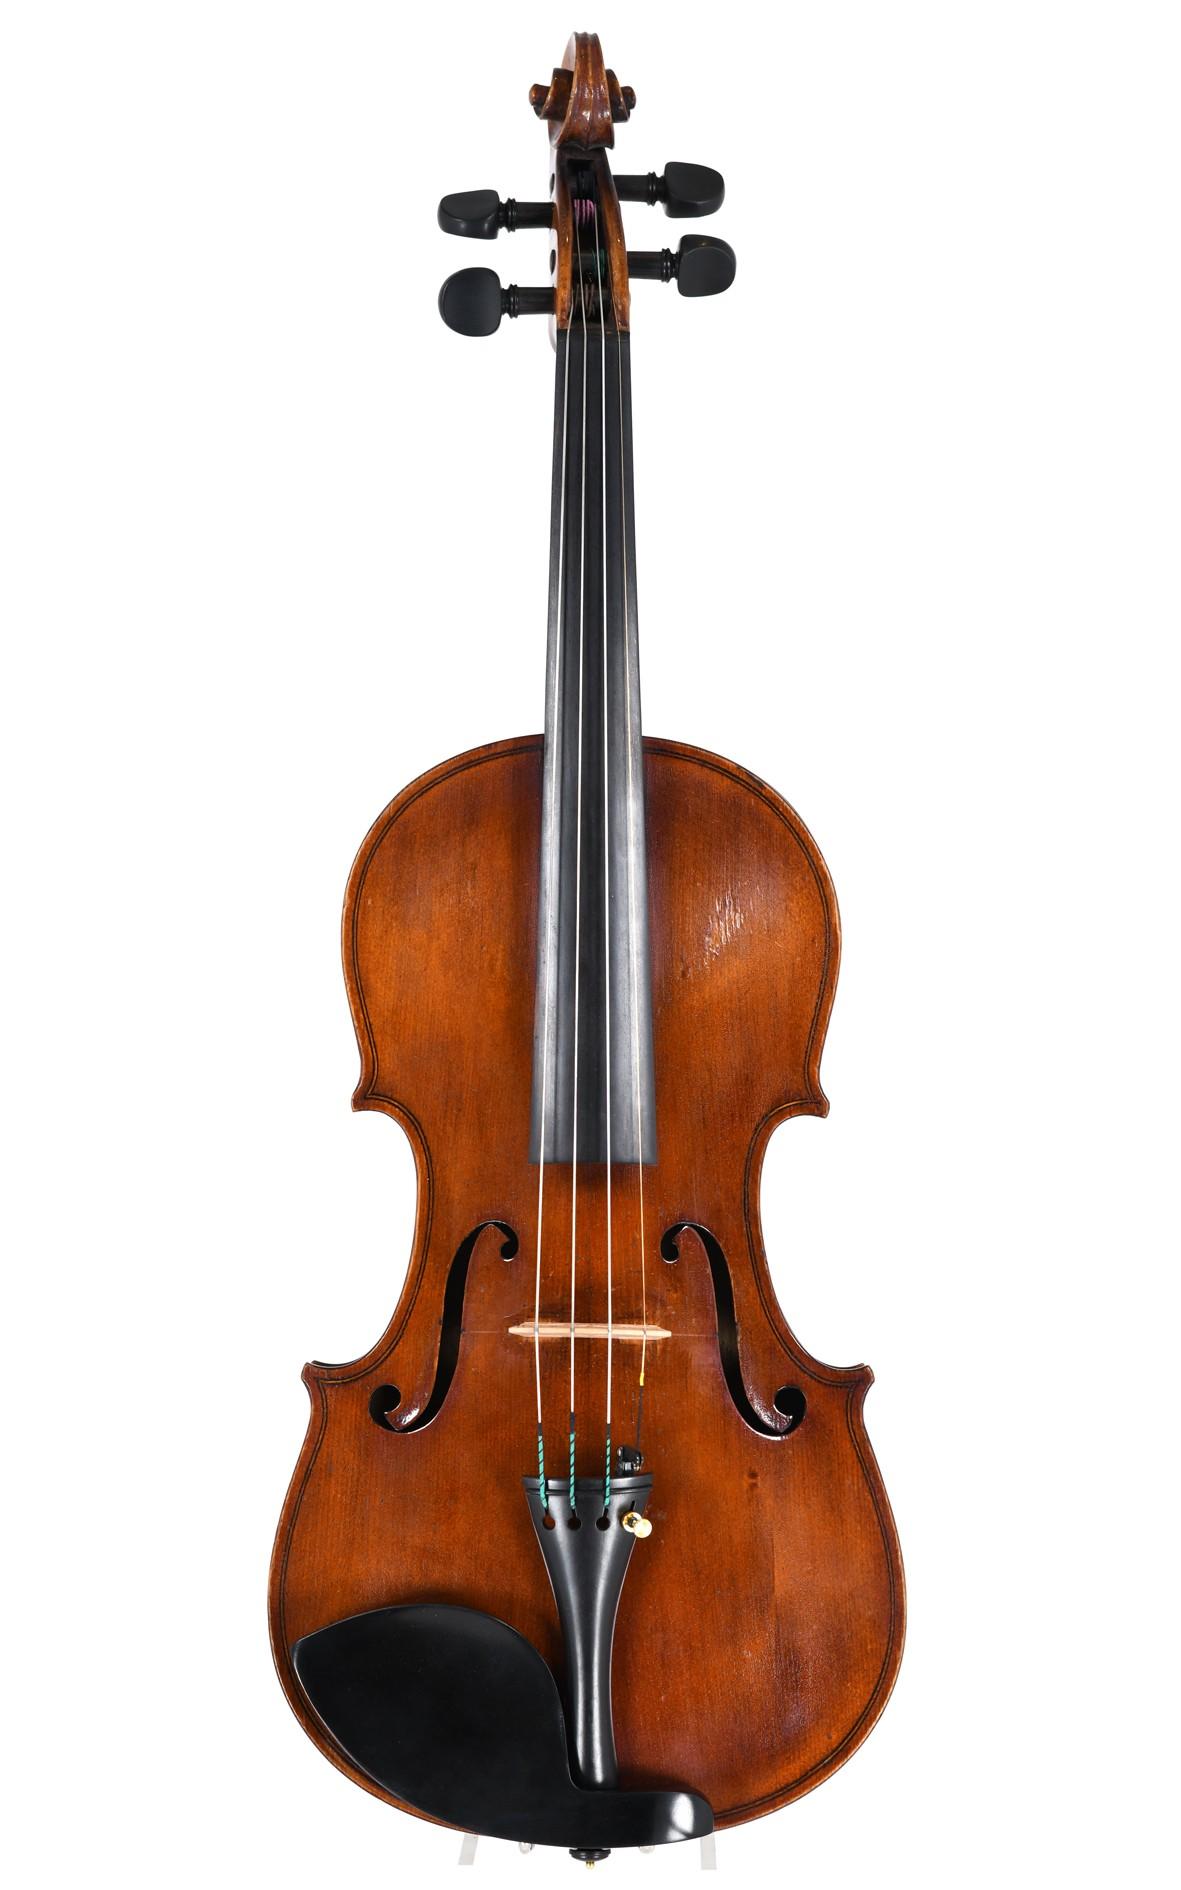 Raffaele Calace, Italian violin 1916 (certificate by Eric Blot)